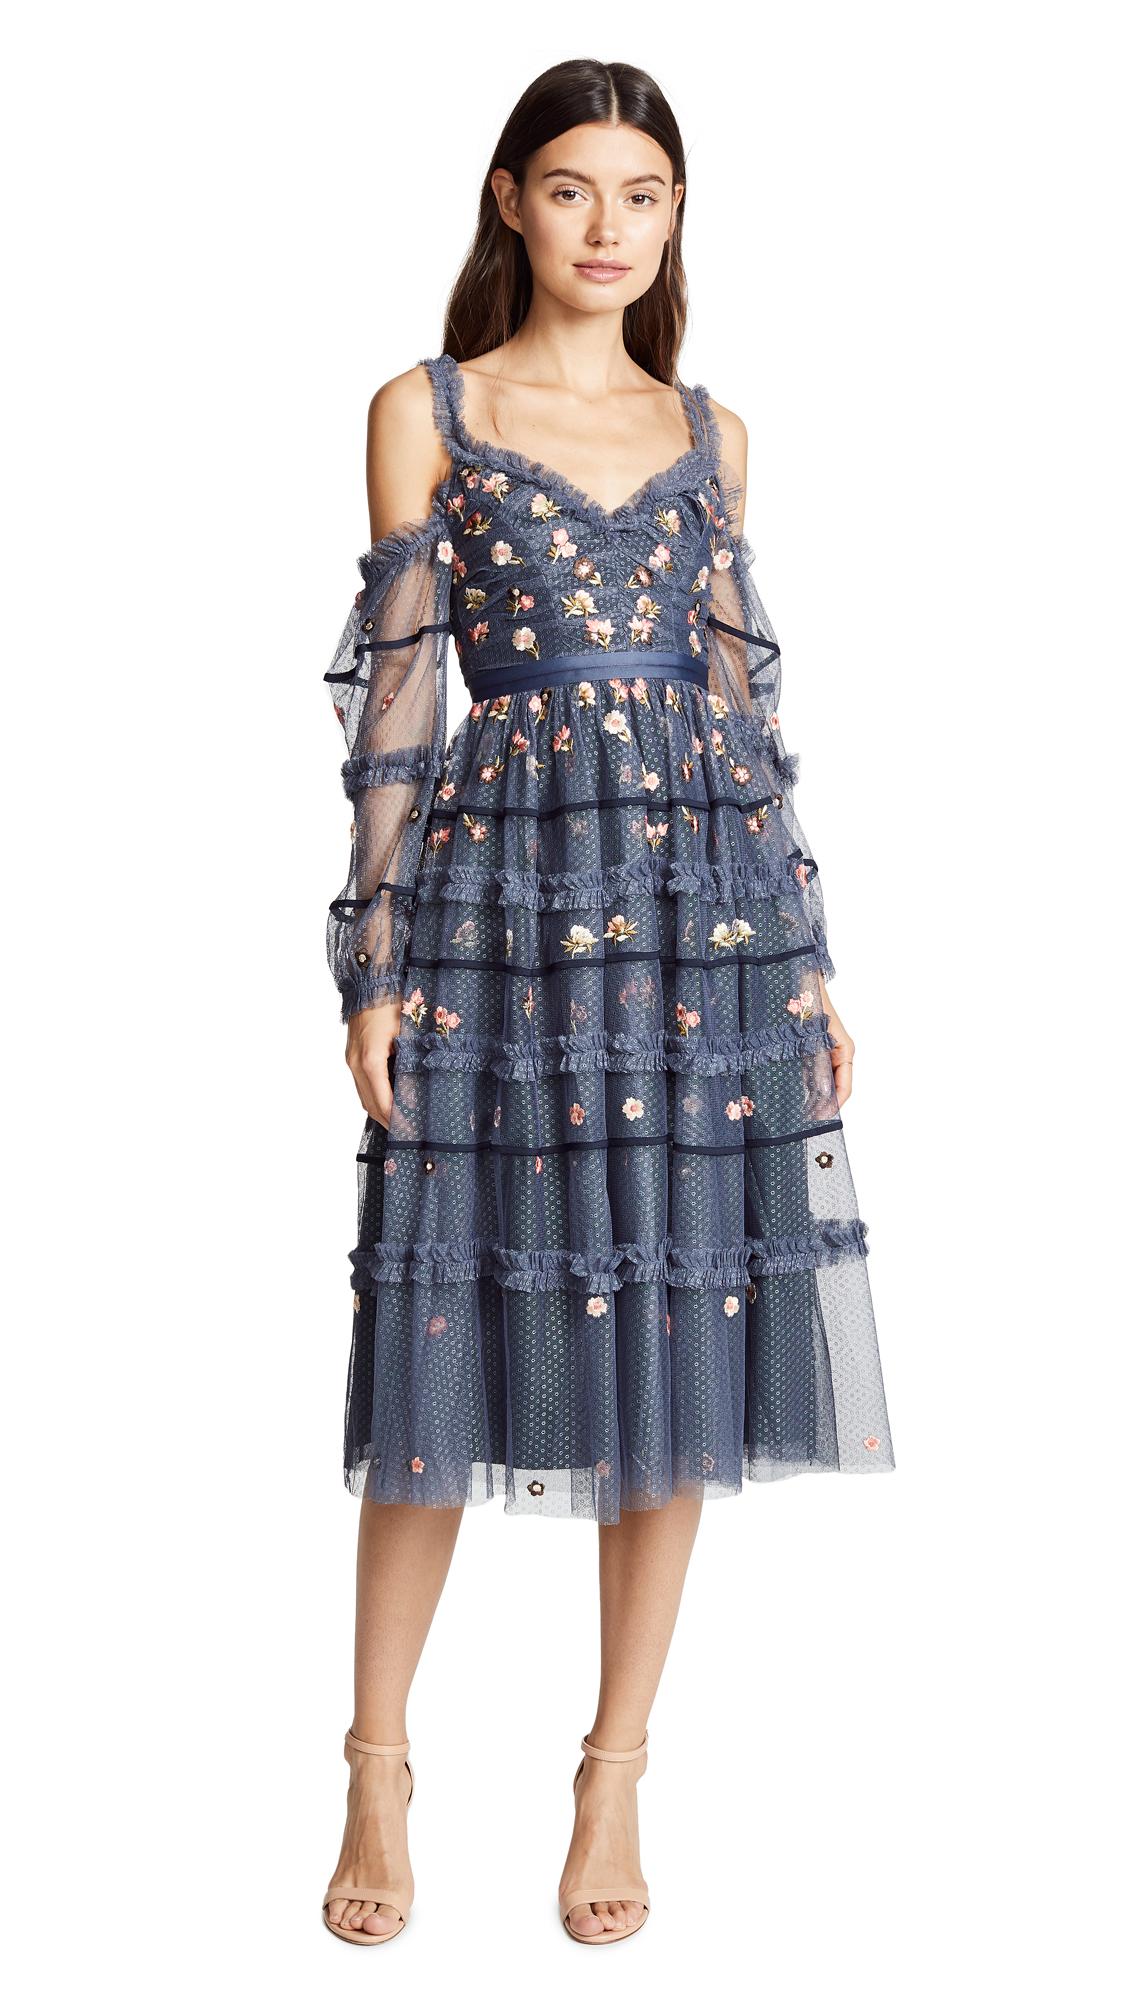 NEEDLE & THREAD CELESTE DRESS